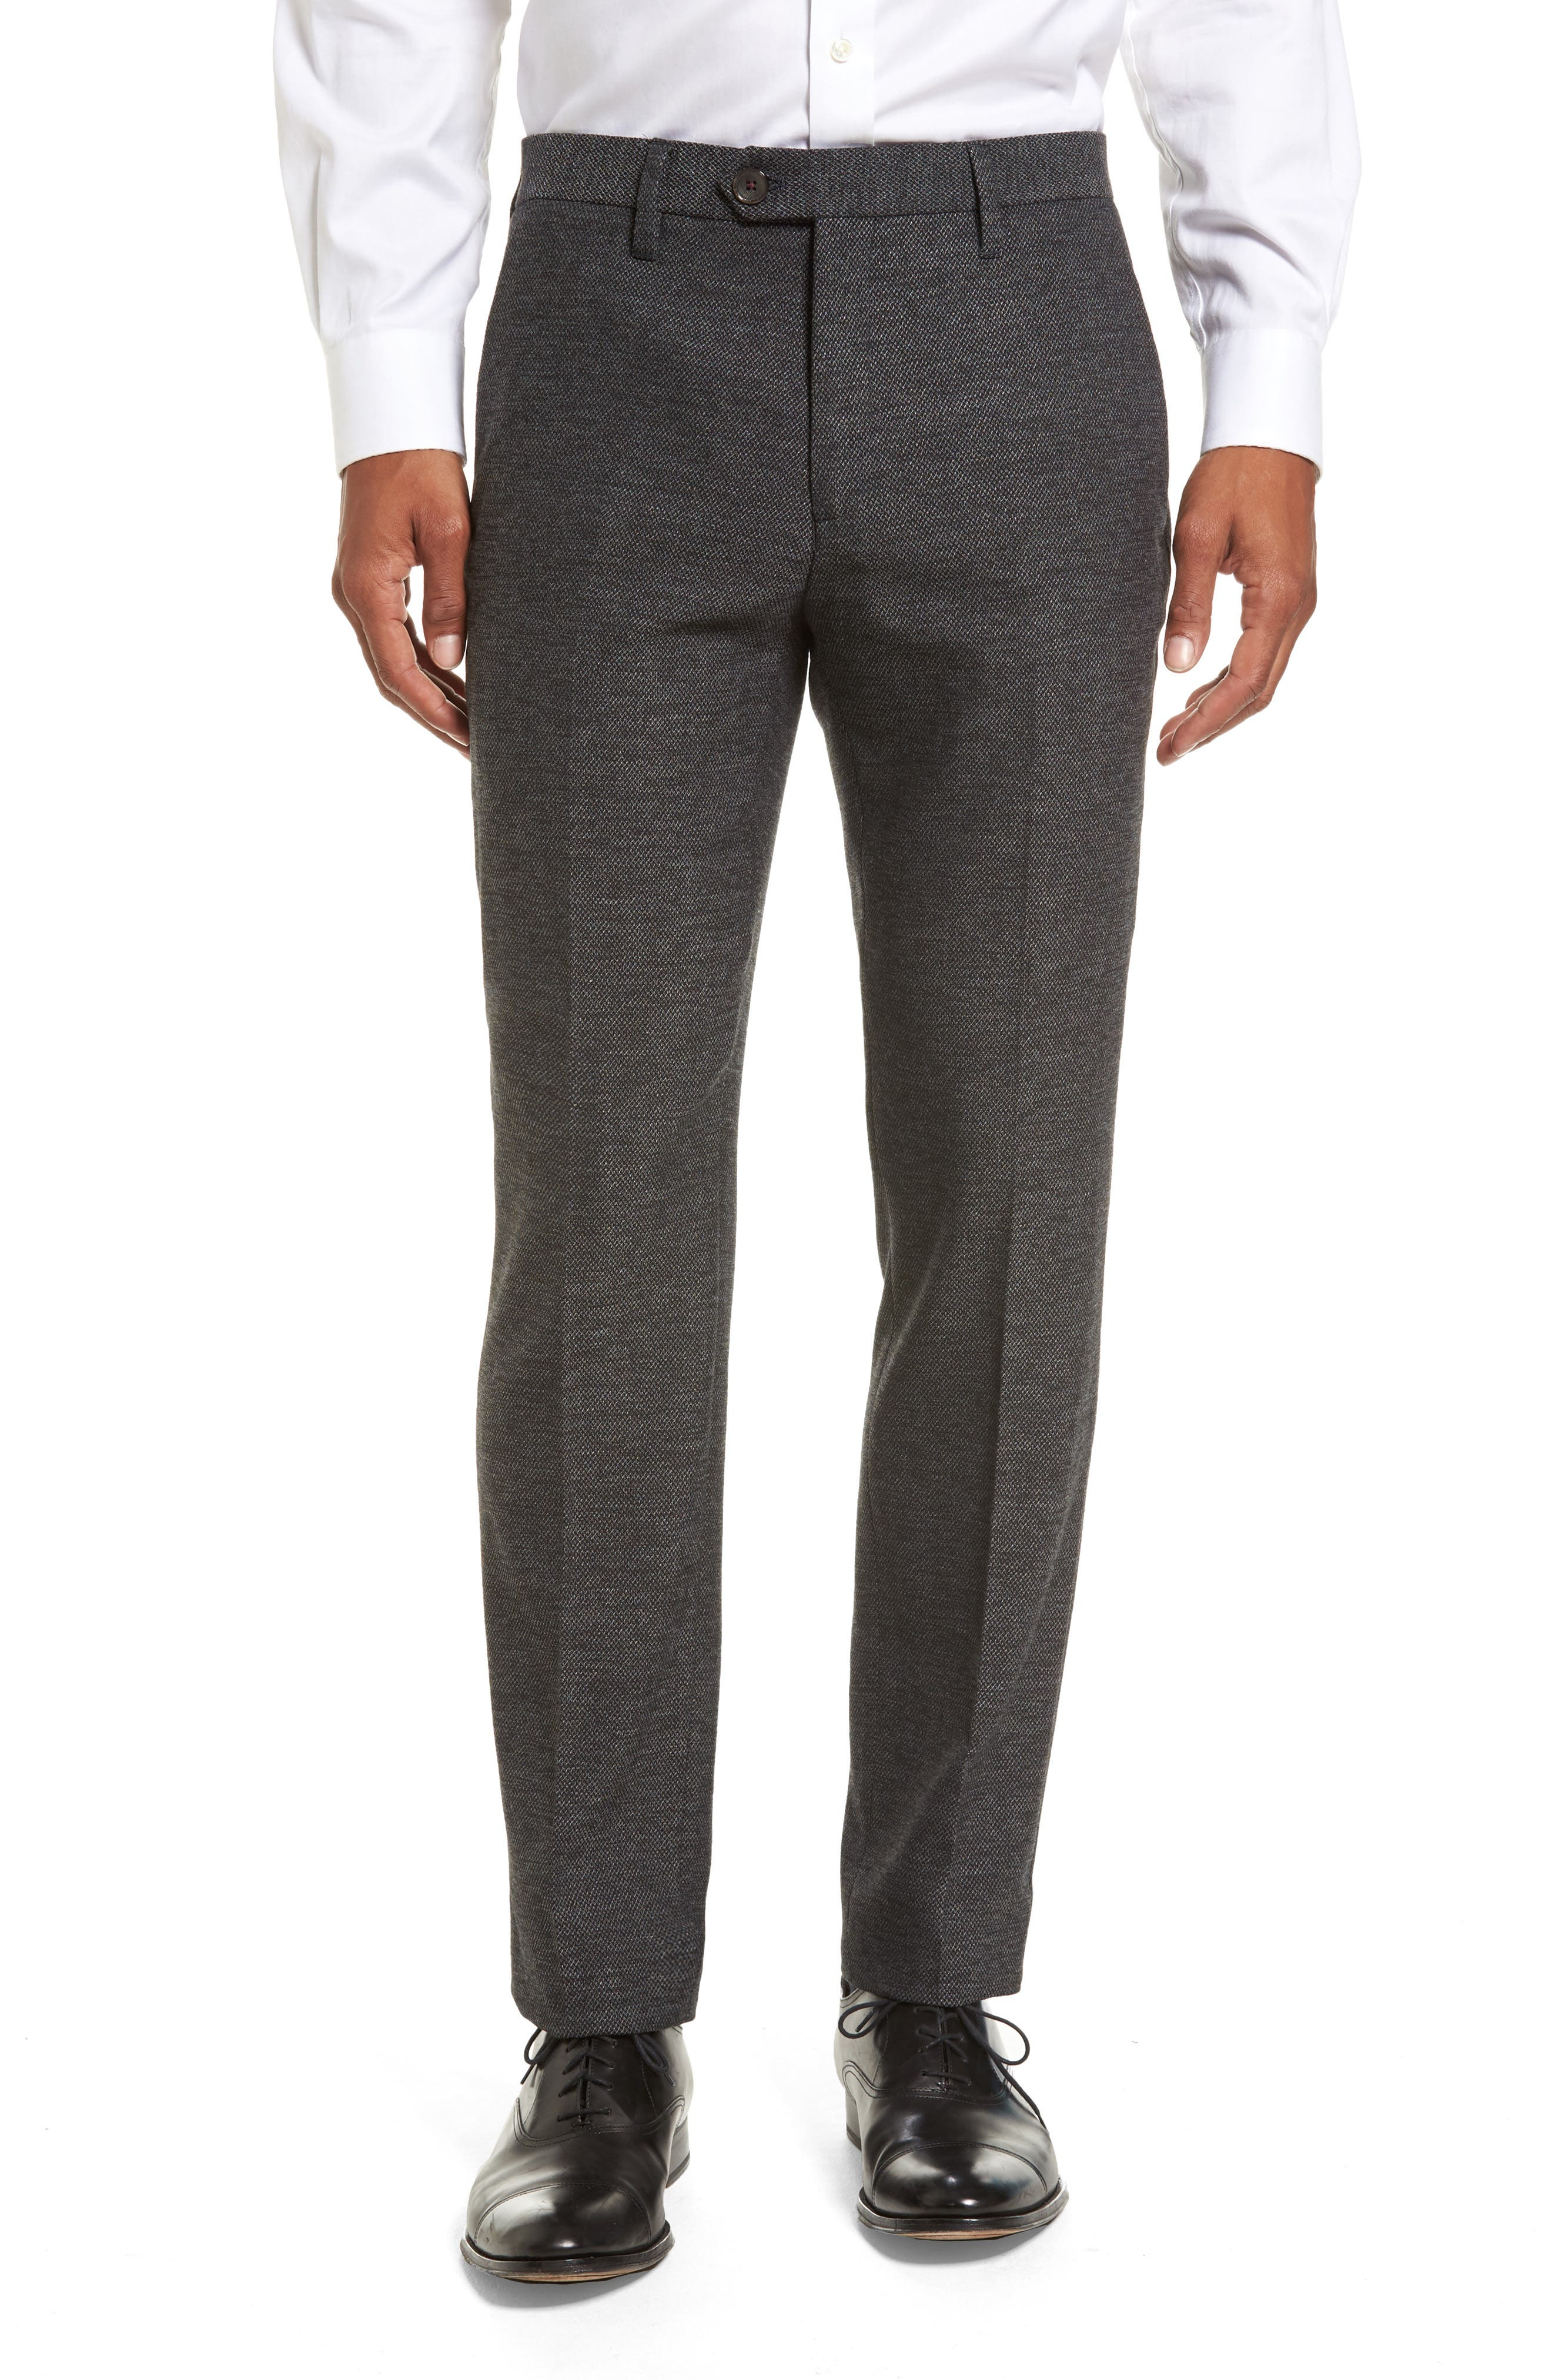 Porttro Modern Slim Fit Trousers,                         Main,                         color, 010